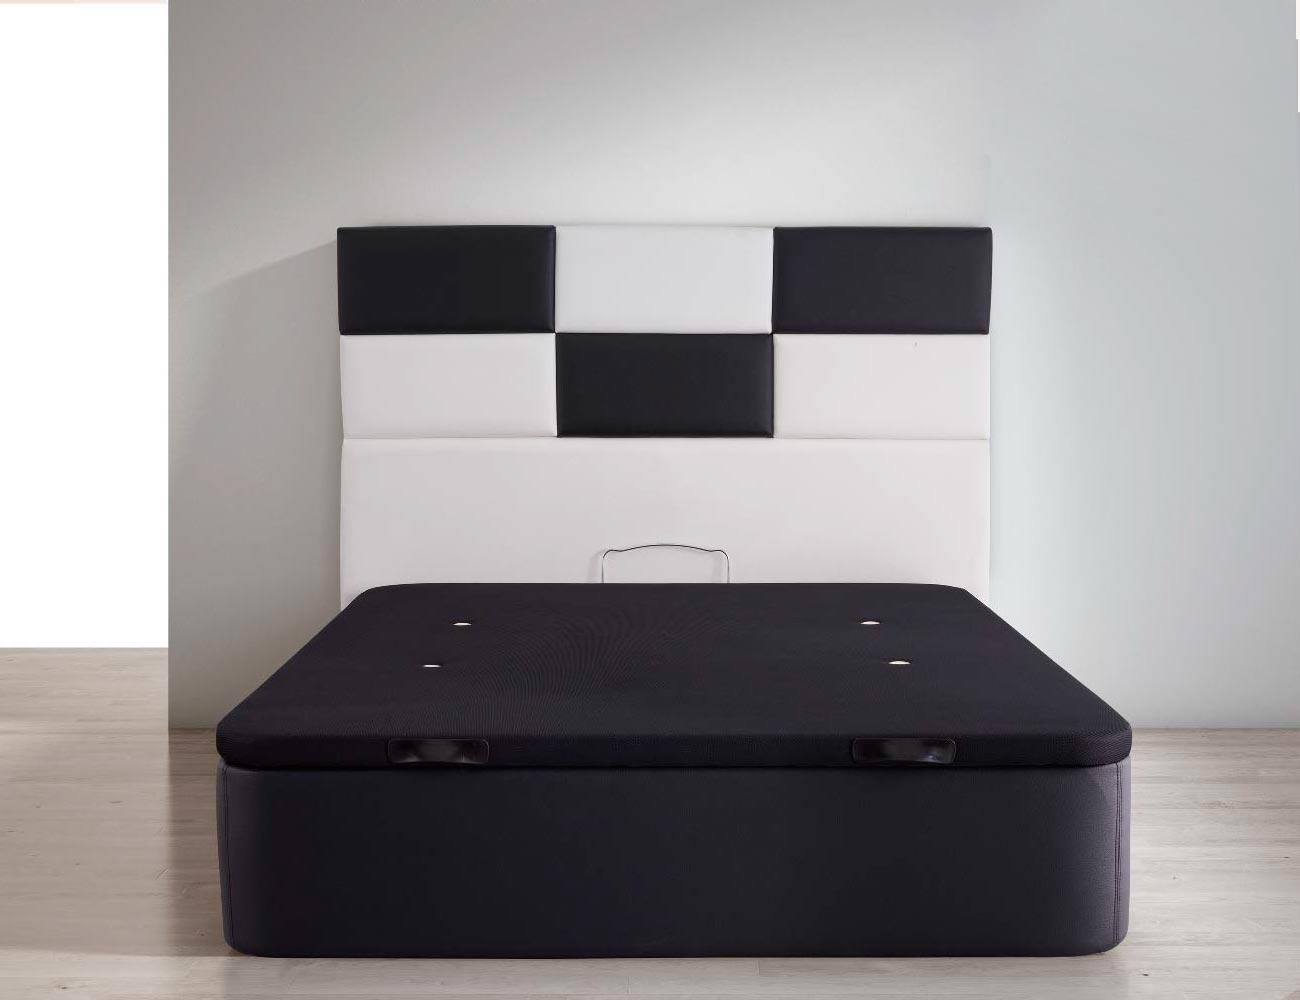 Canape polipiel tapa 3d negro aireado polimax